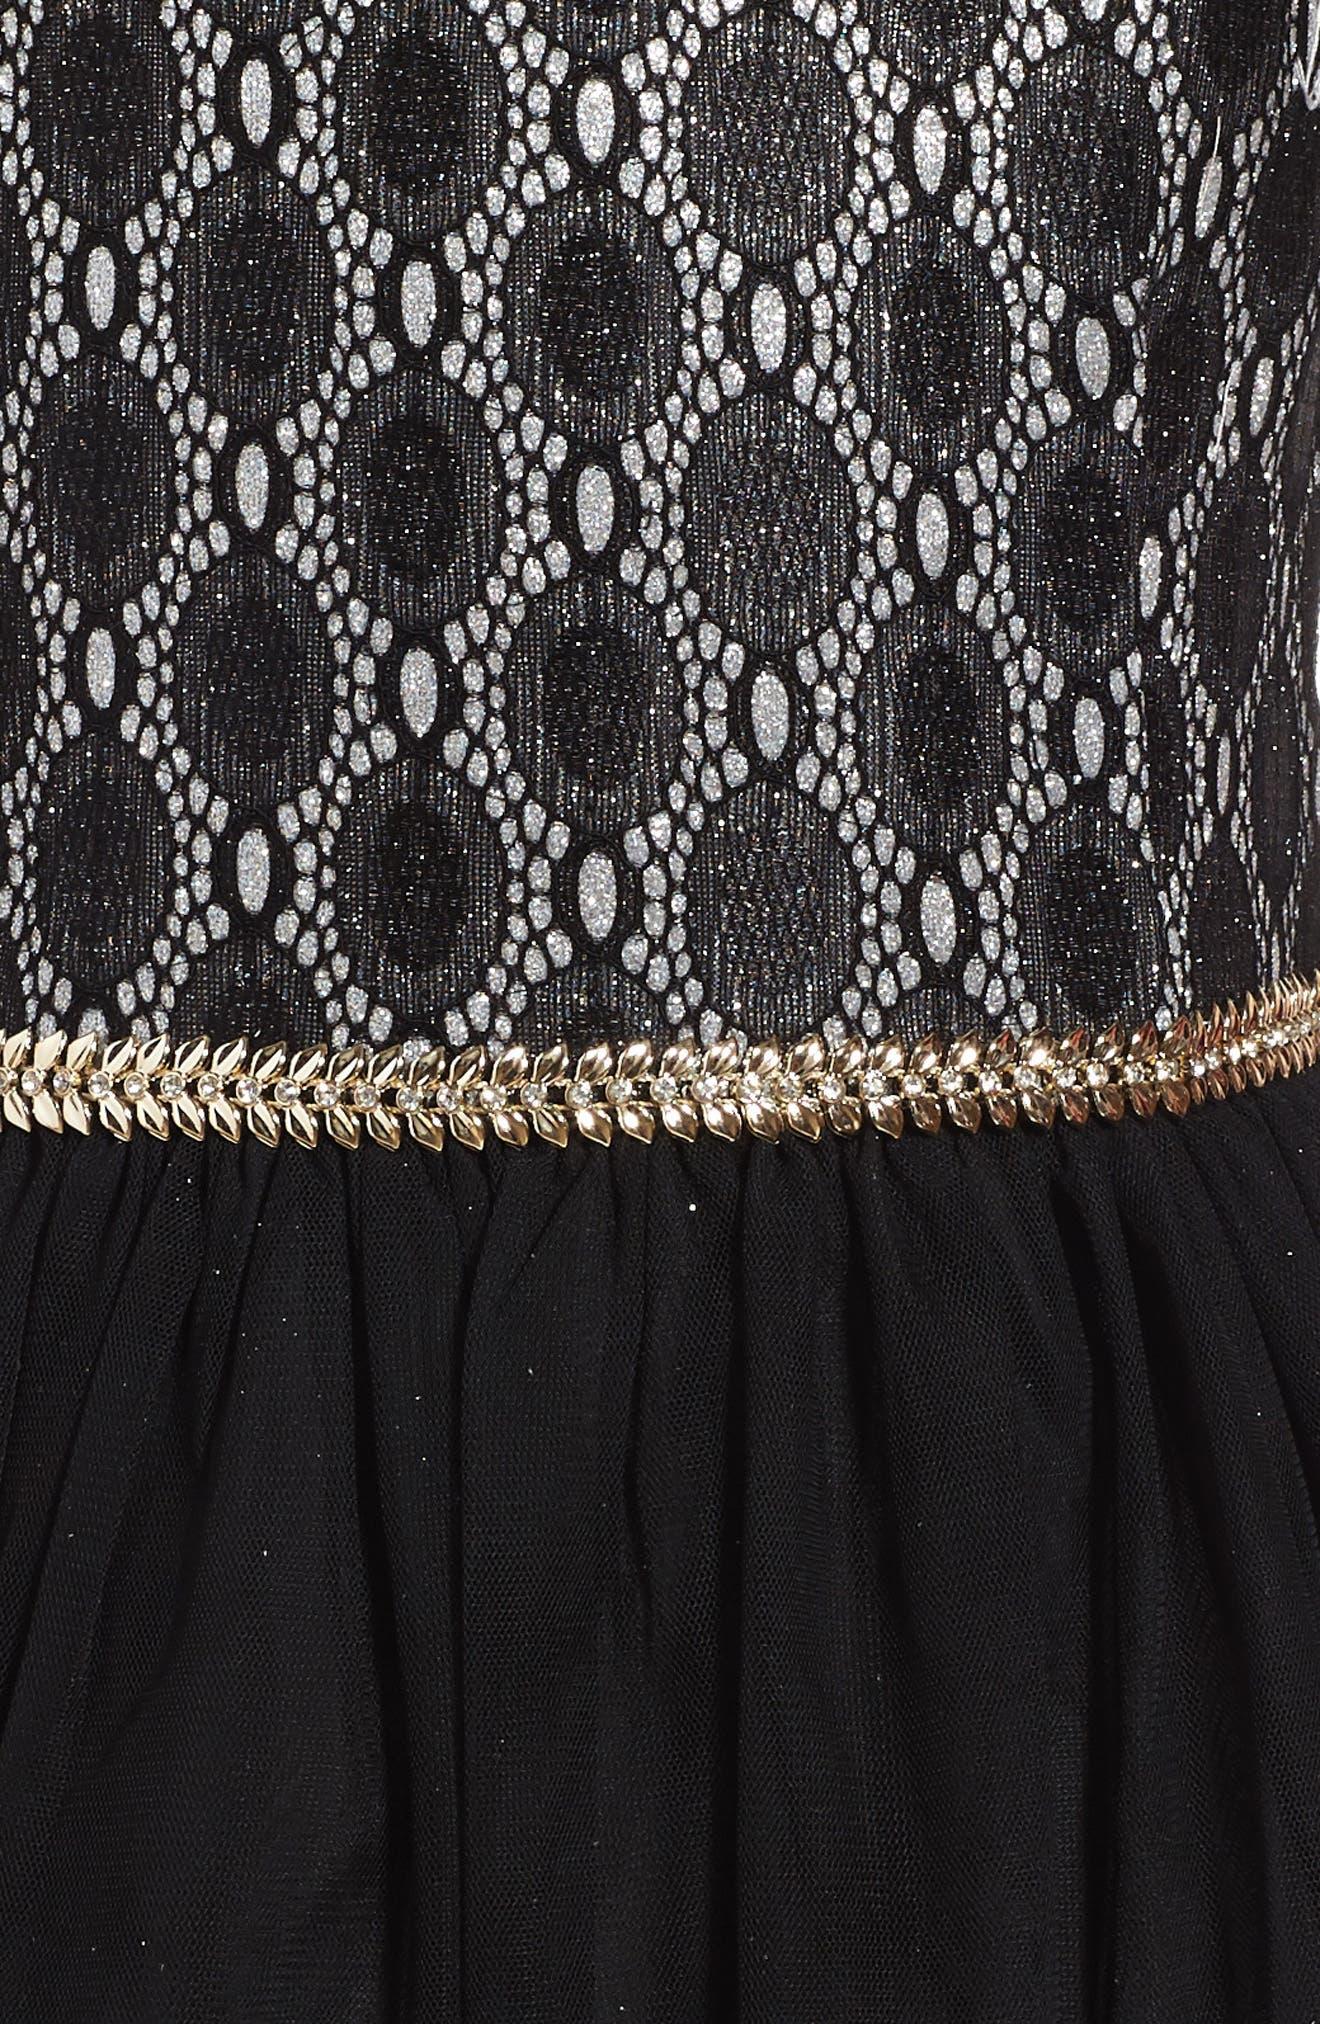 Glitter Lace Dress,                             Alternate thumbnail 3, color,                             001